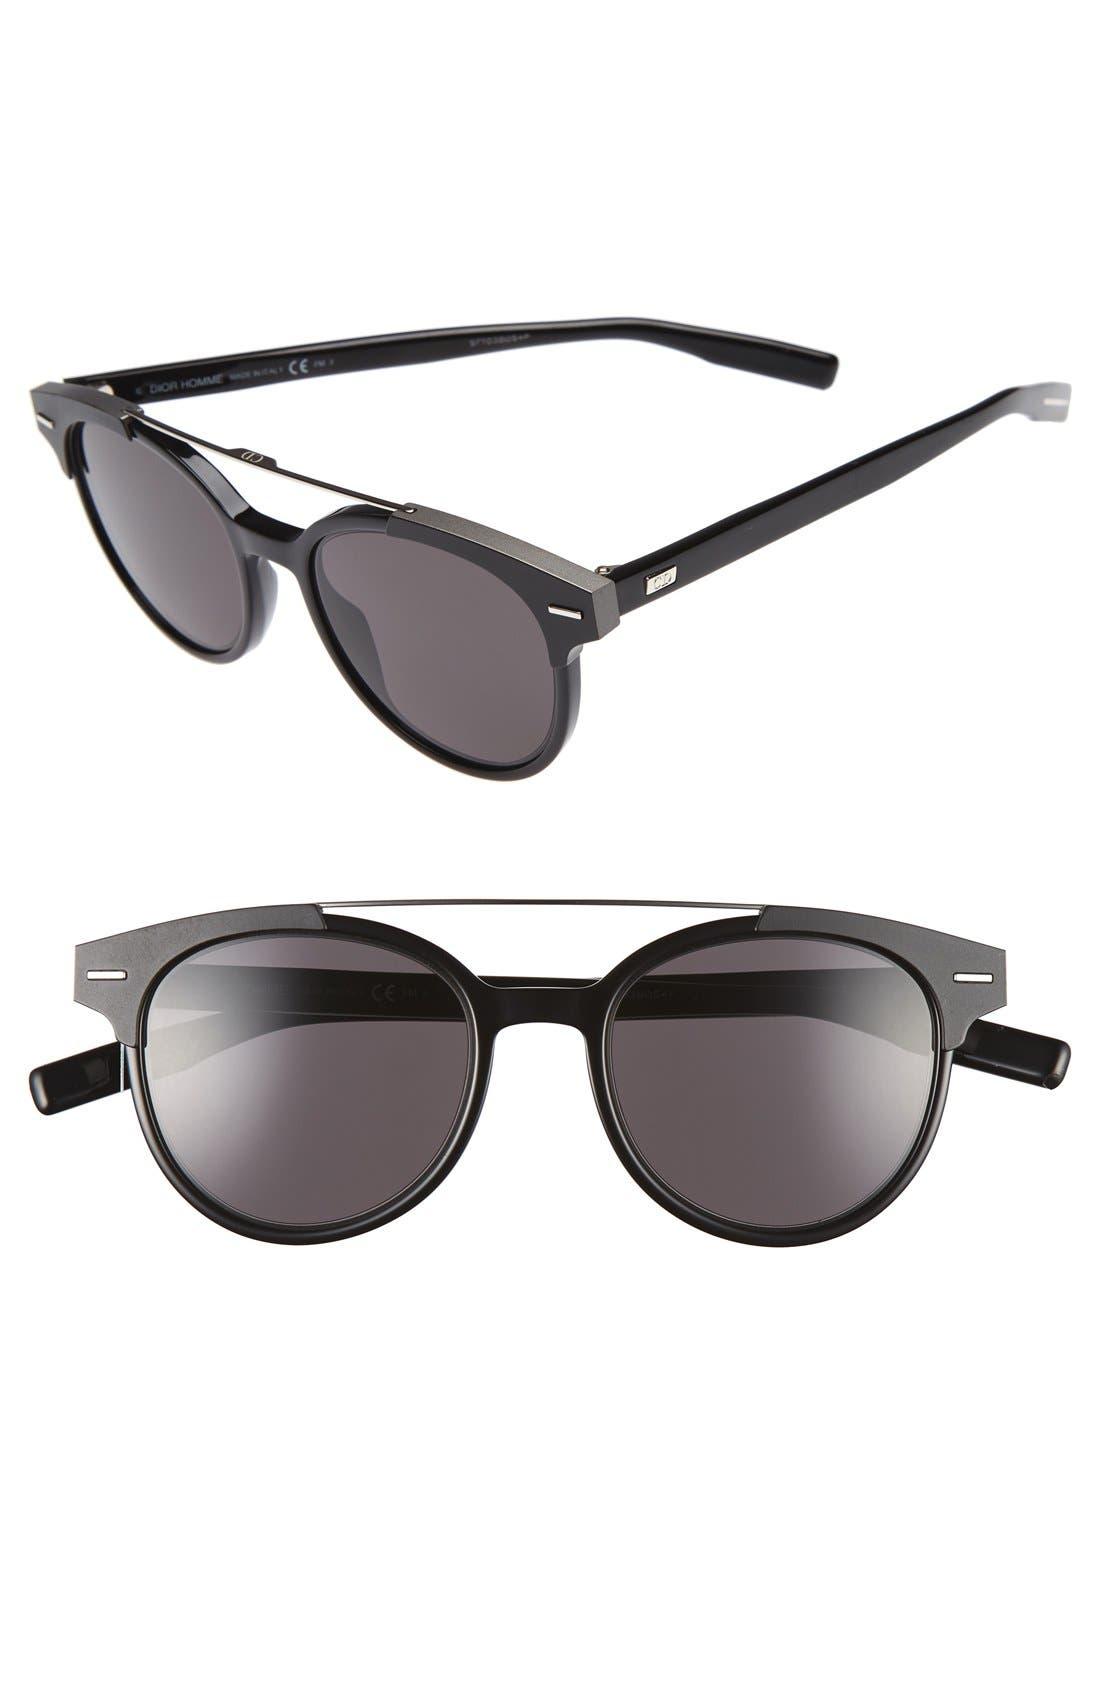 Dior 'Black Tie' 51mm Sunglasses,                             Main thumbnail 1, color,                             Black